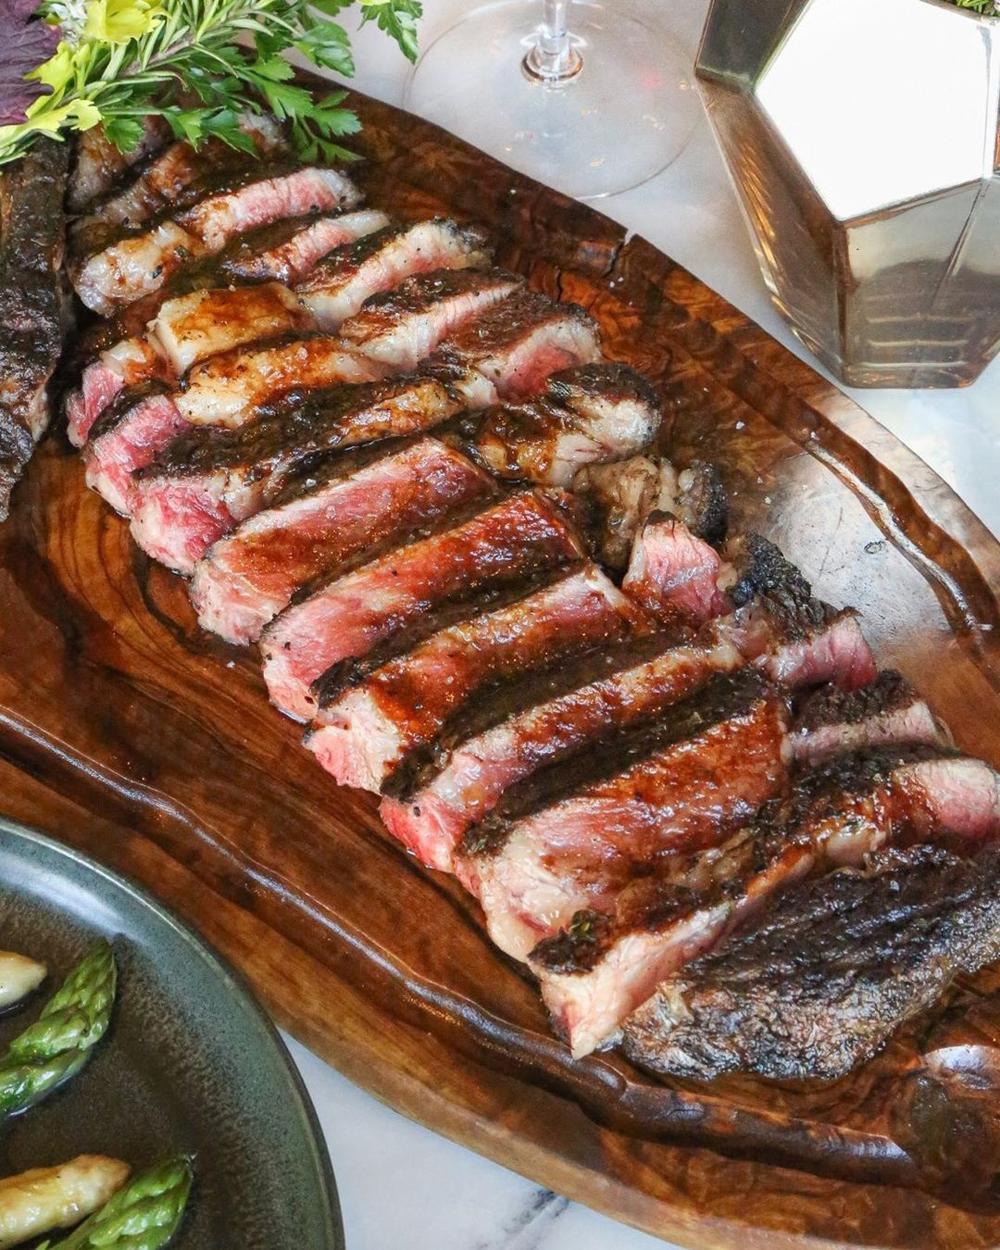 A steak sliced on a wooden cutting board